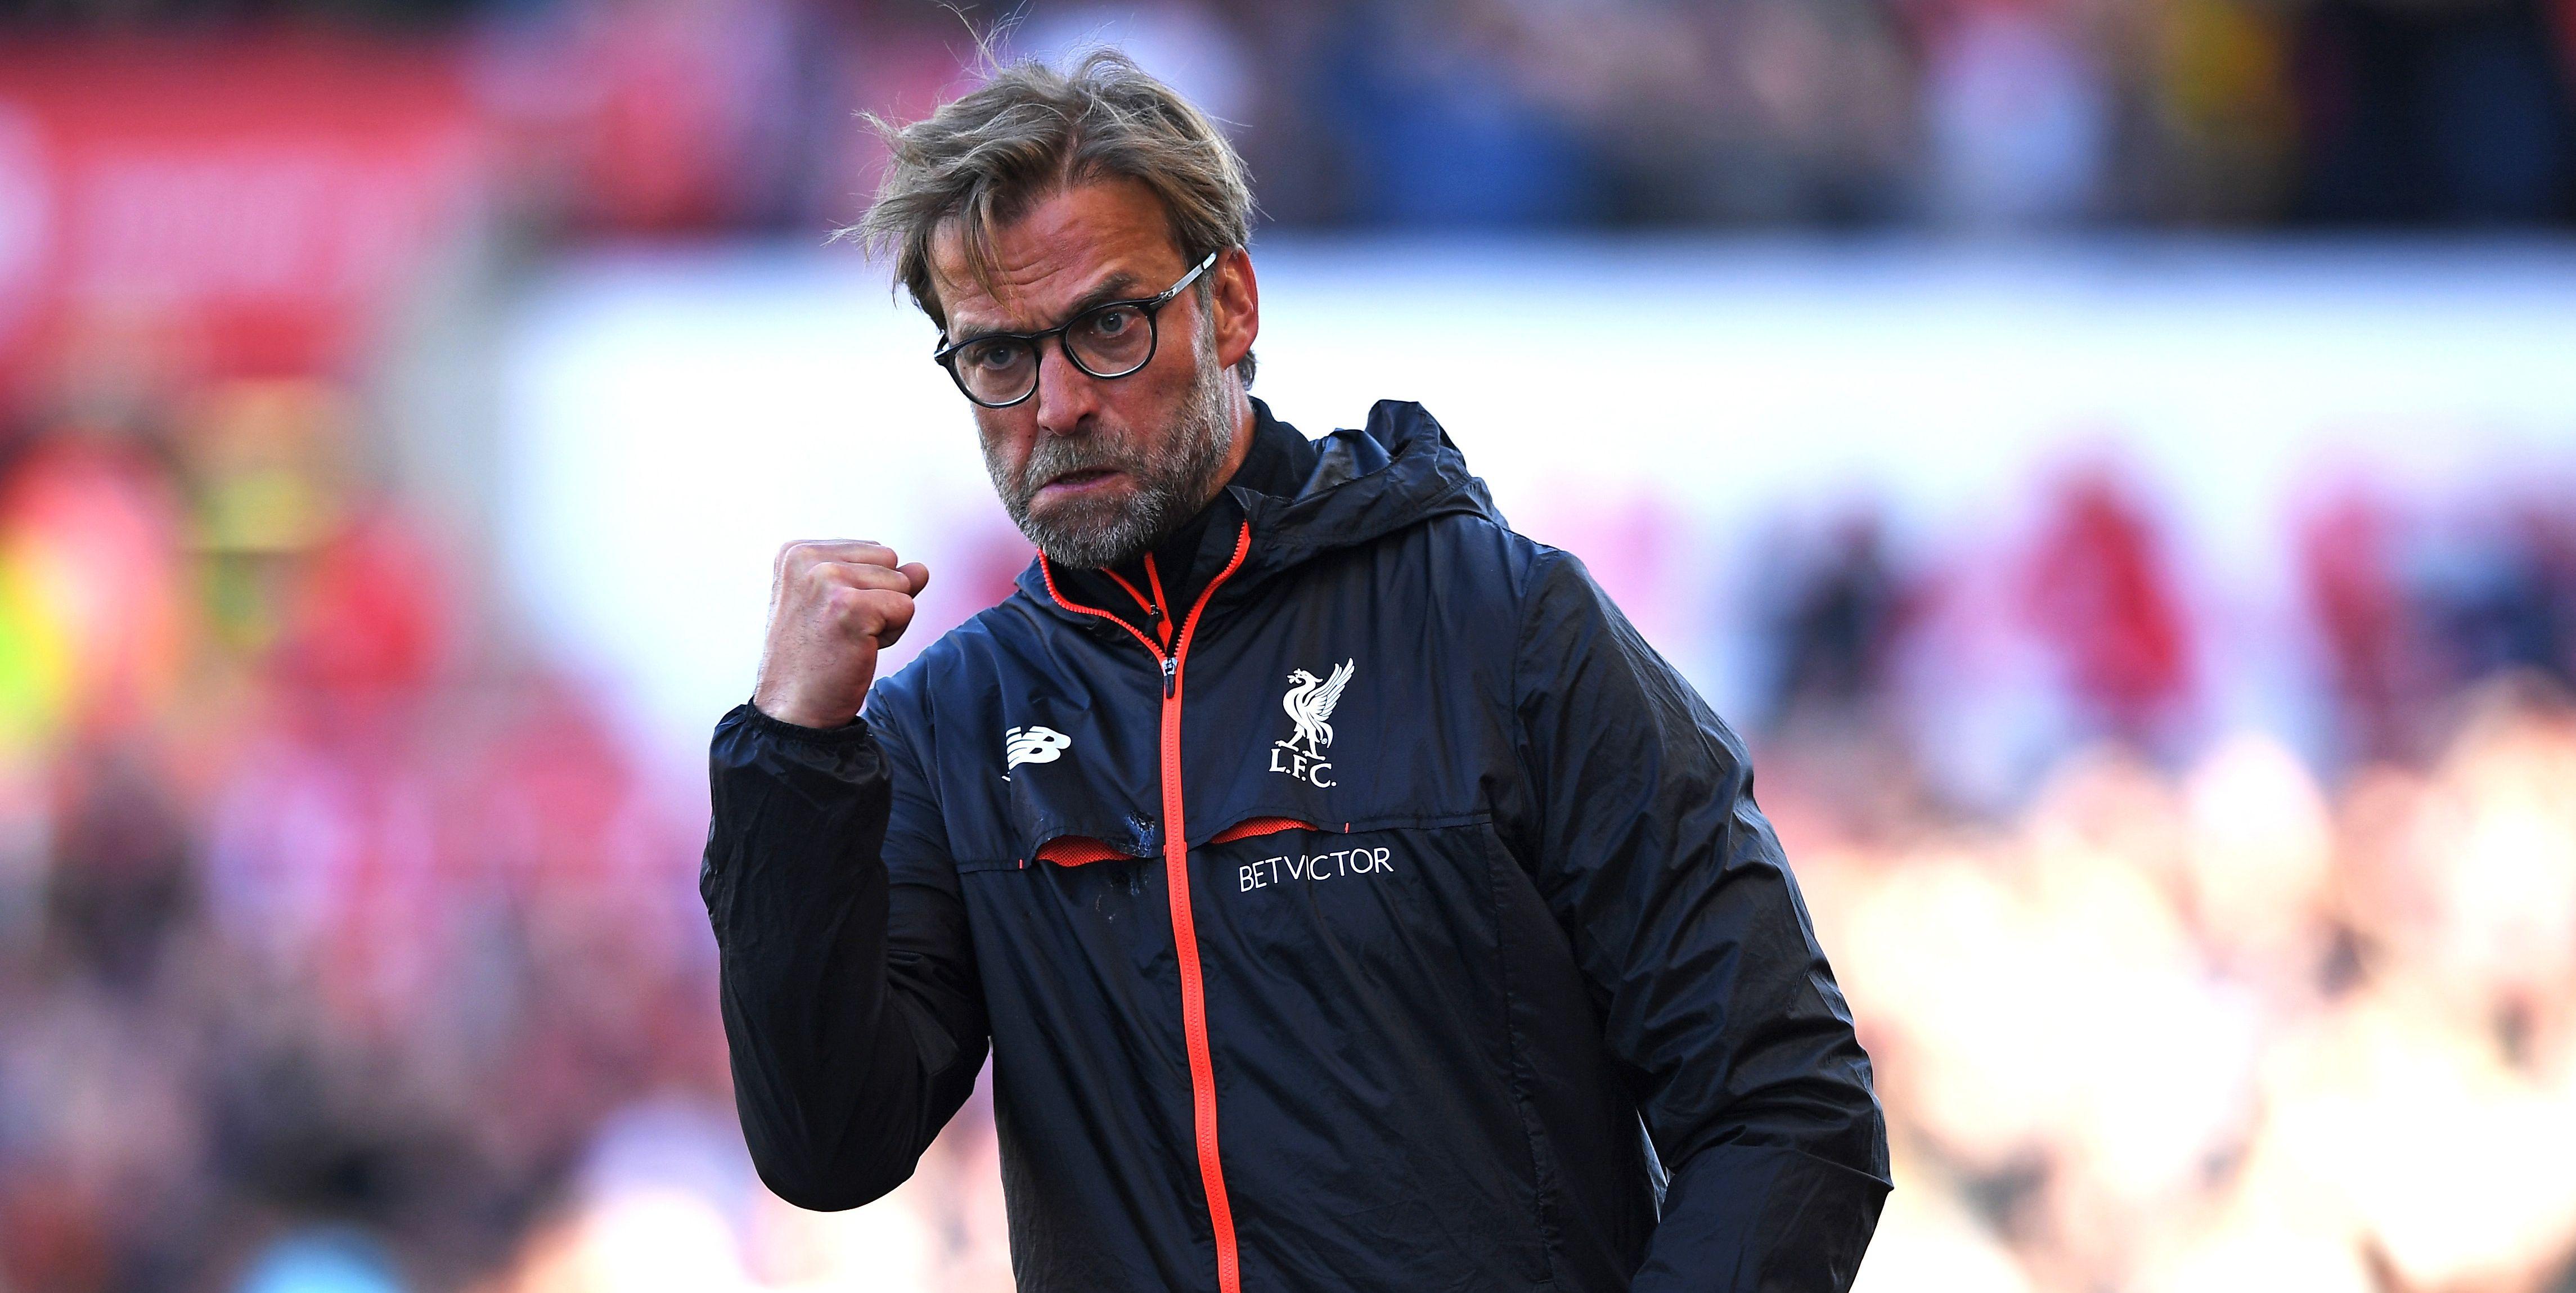 Liverpool's Jurgen Klopp celebrates a Premier League win.